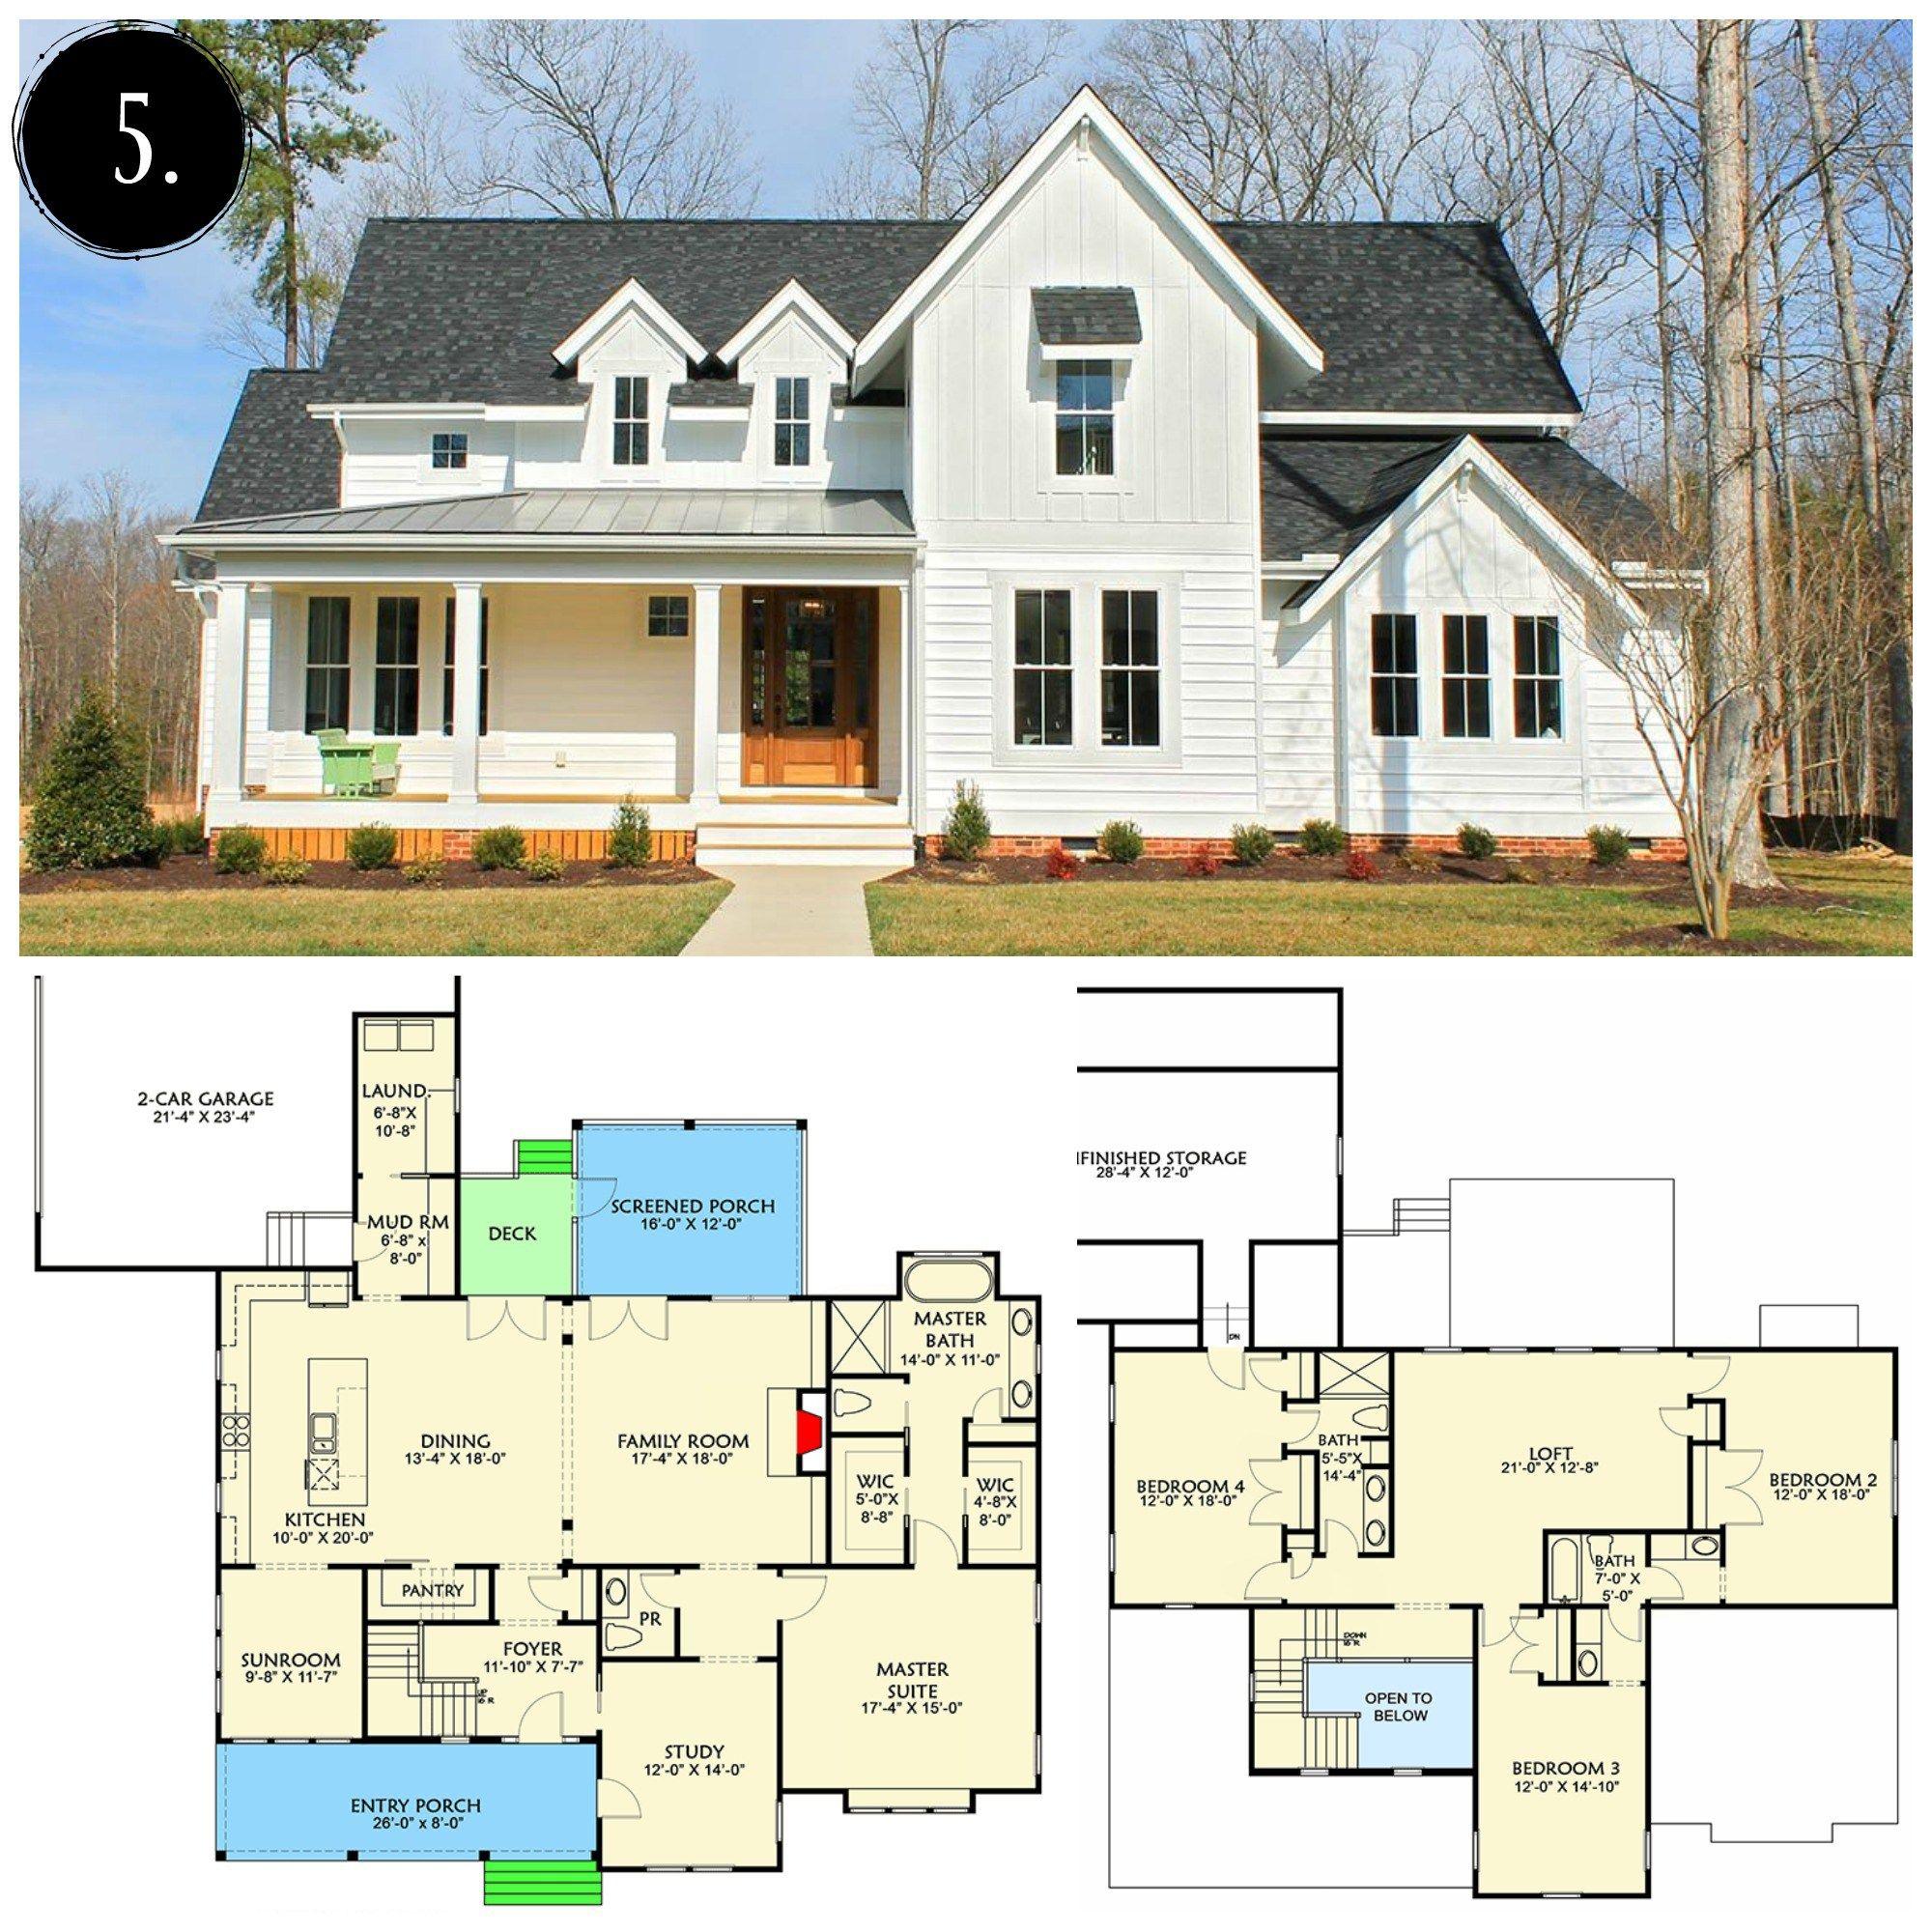 12 Modern Farmhouse Floor Plans Rooms For Rent Blog Farmhouse Floor Plans Modern Farmhouse Floorplan Farmhouse Layout